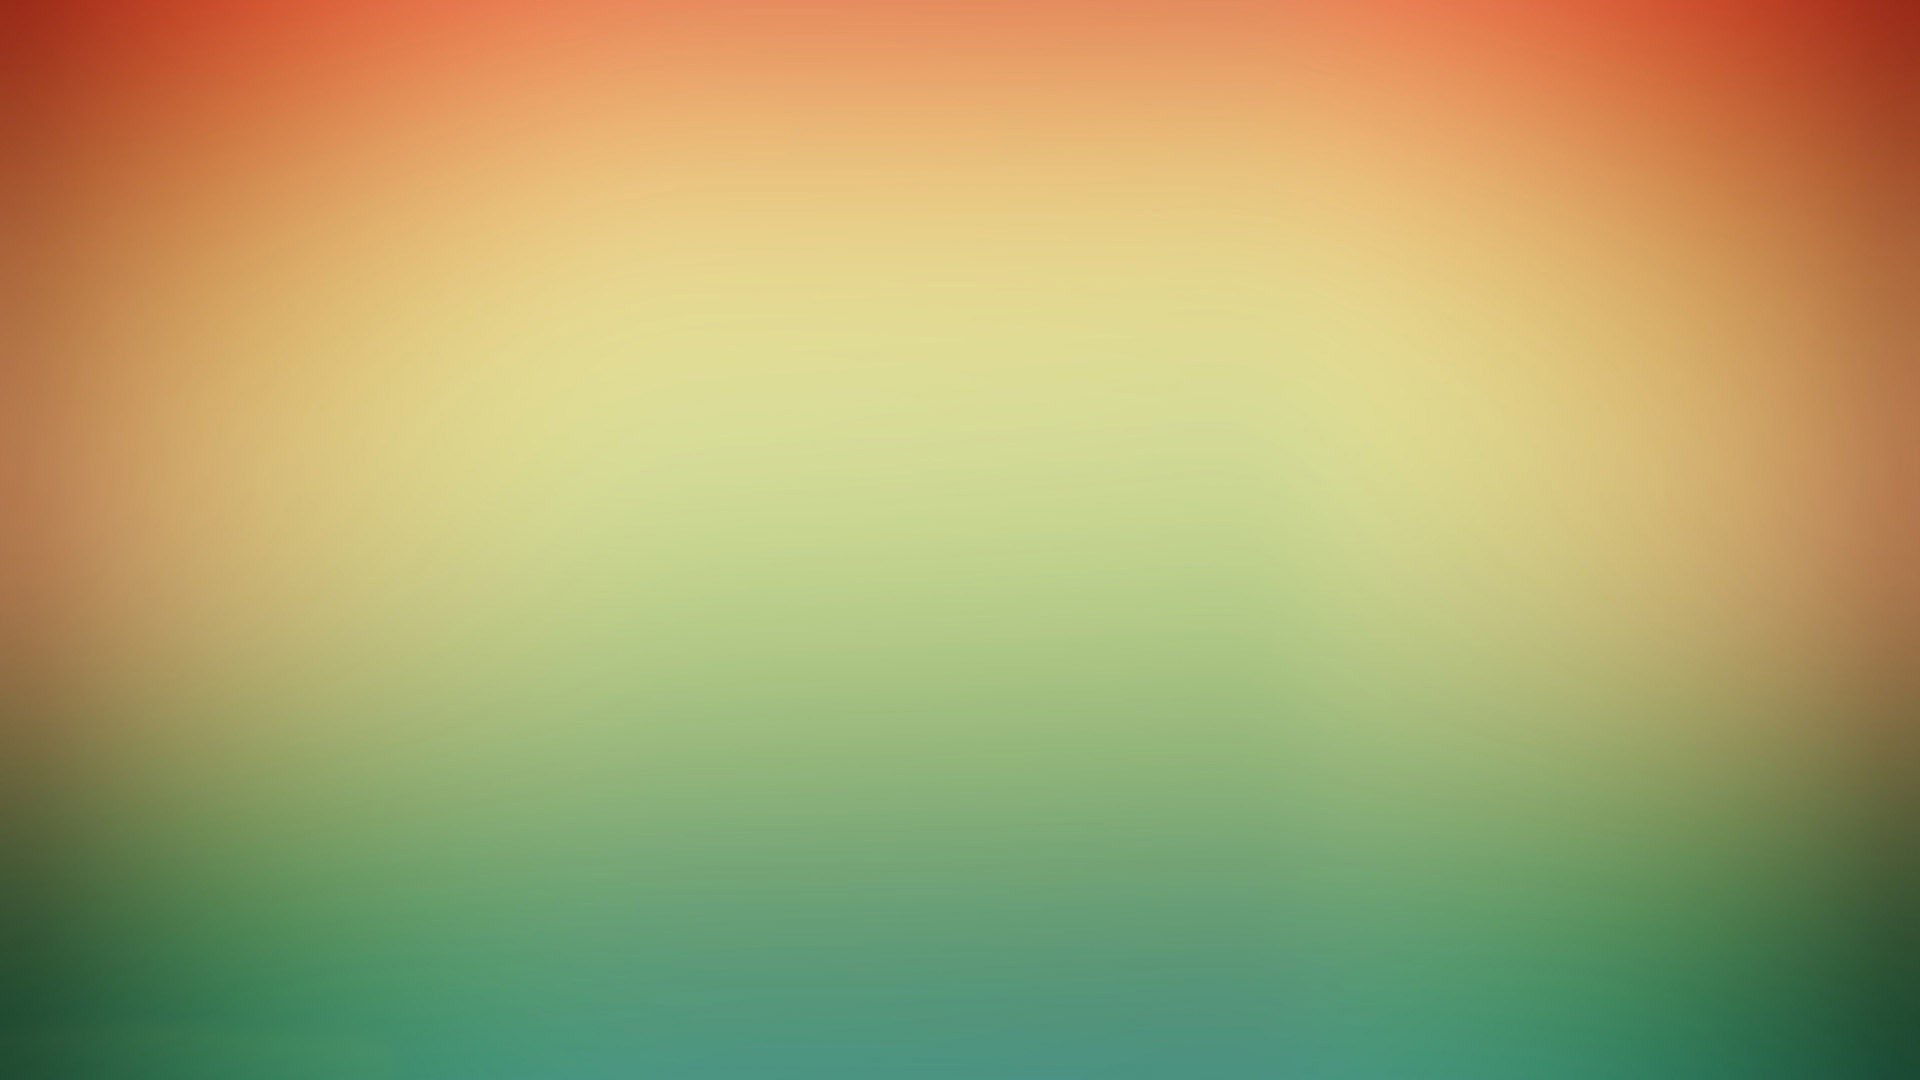 Green and orange gradient wallpaper #9814